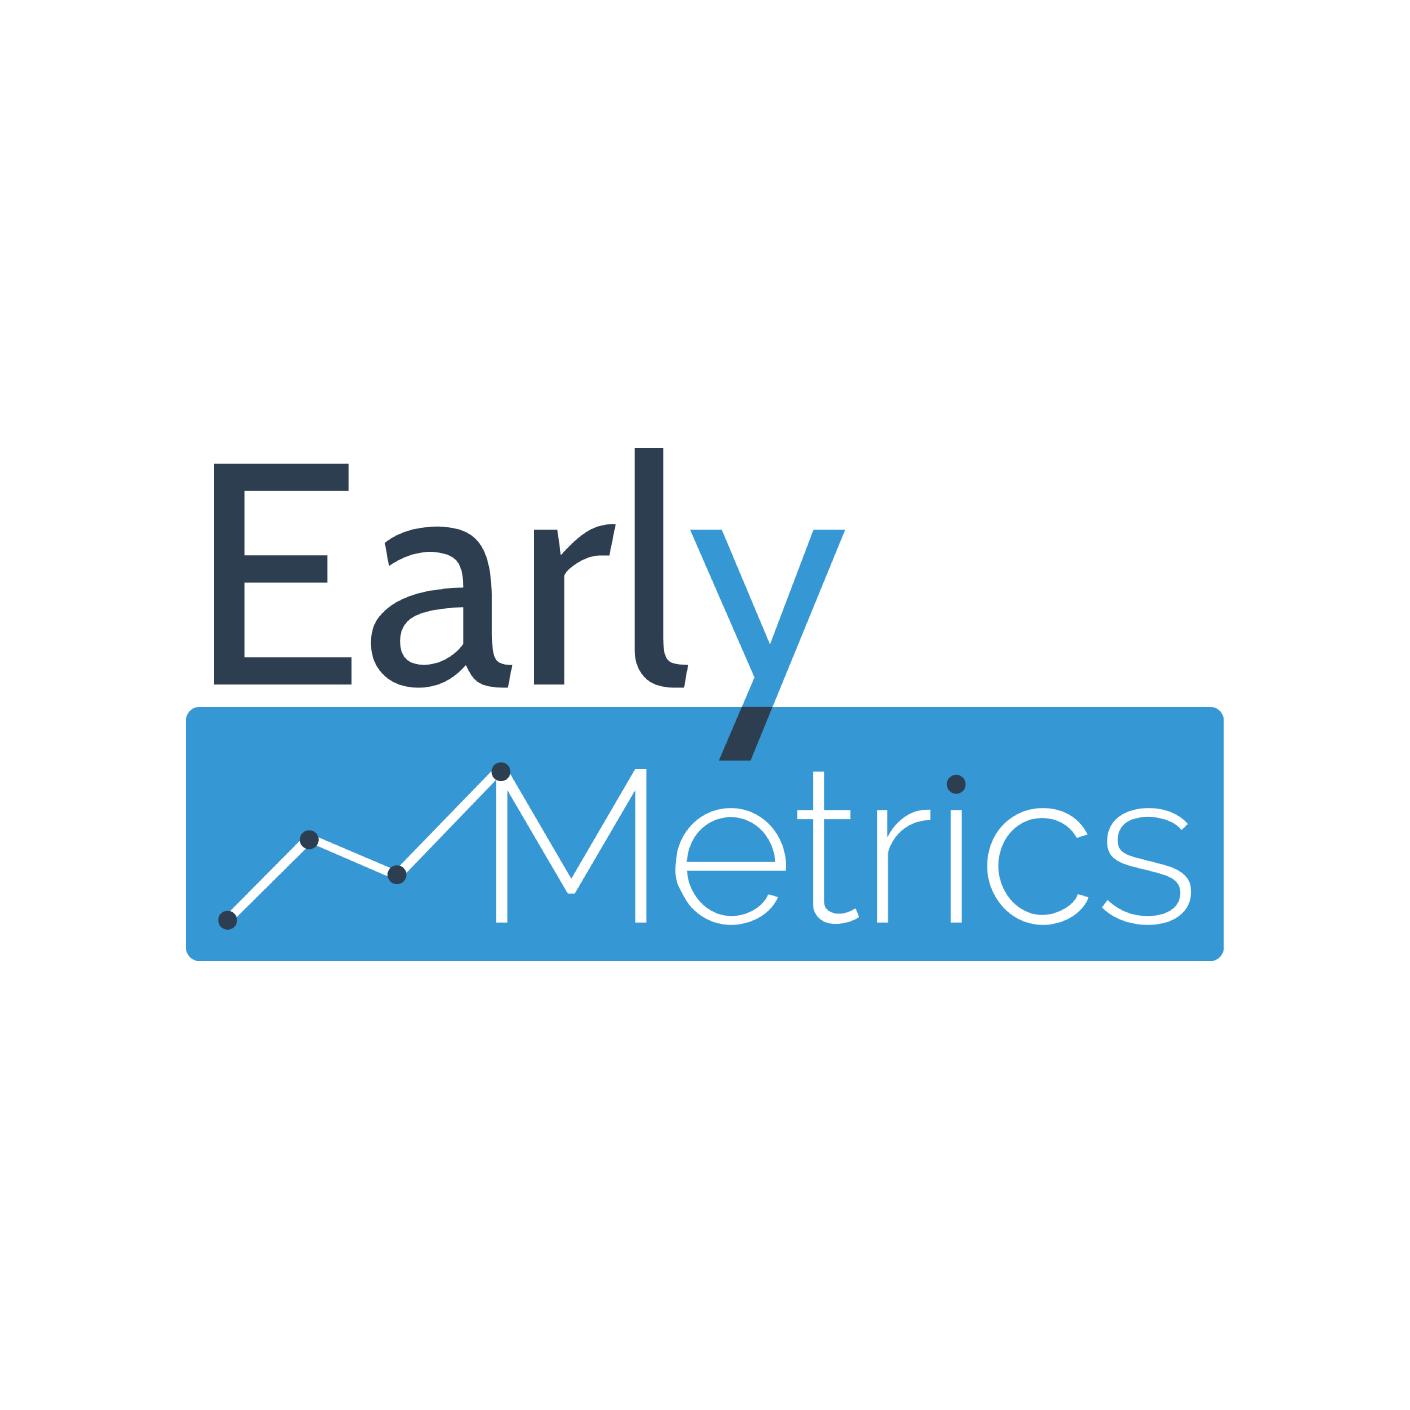 Earlymetrics